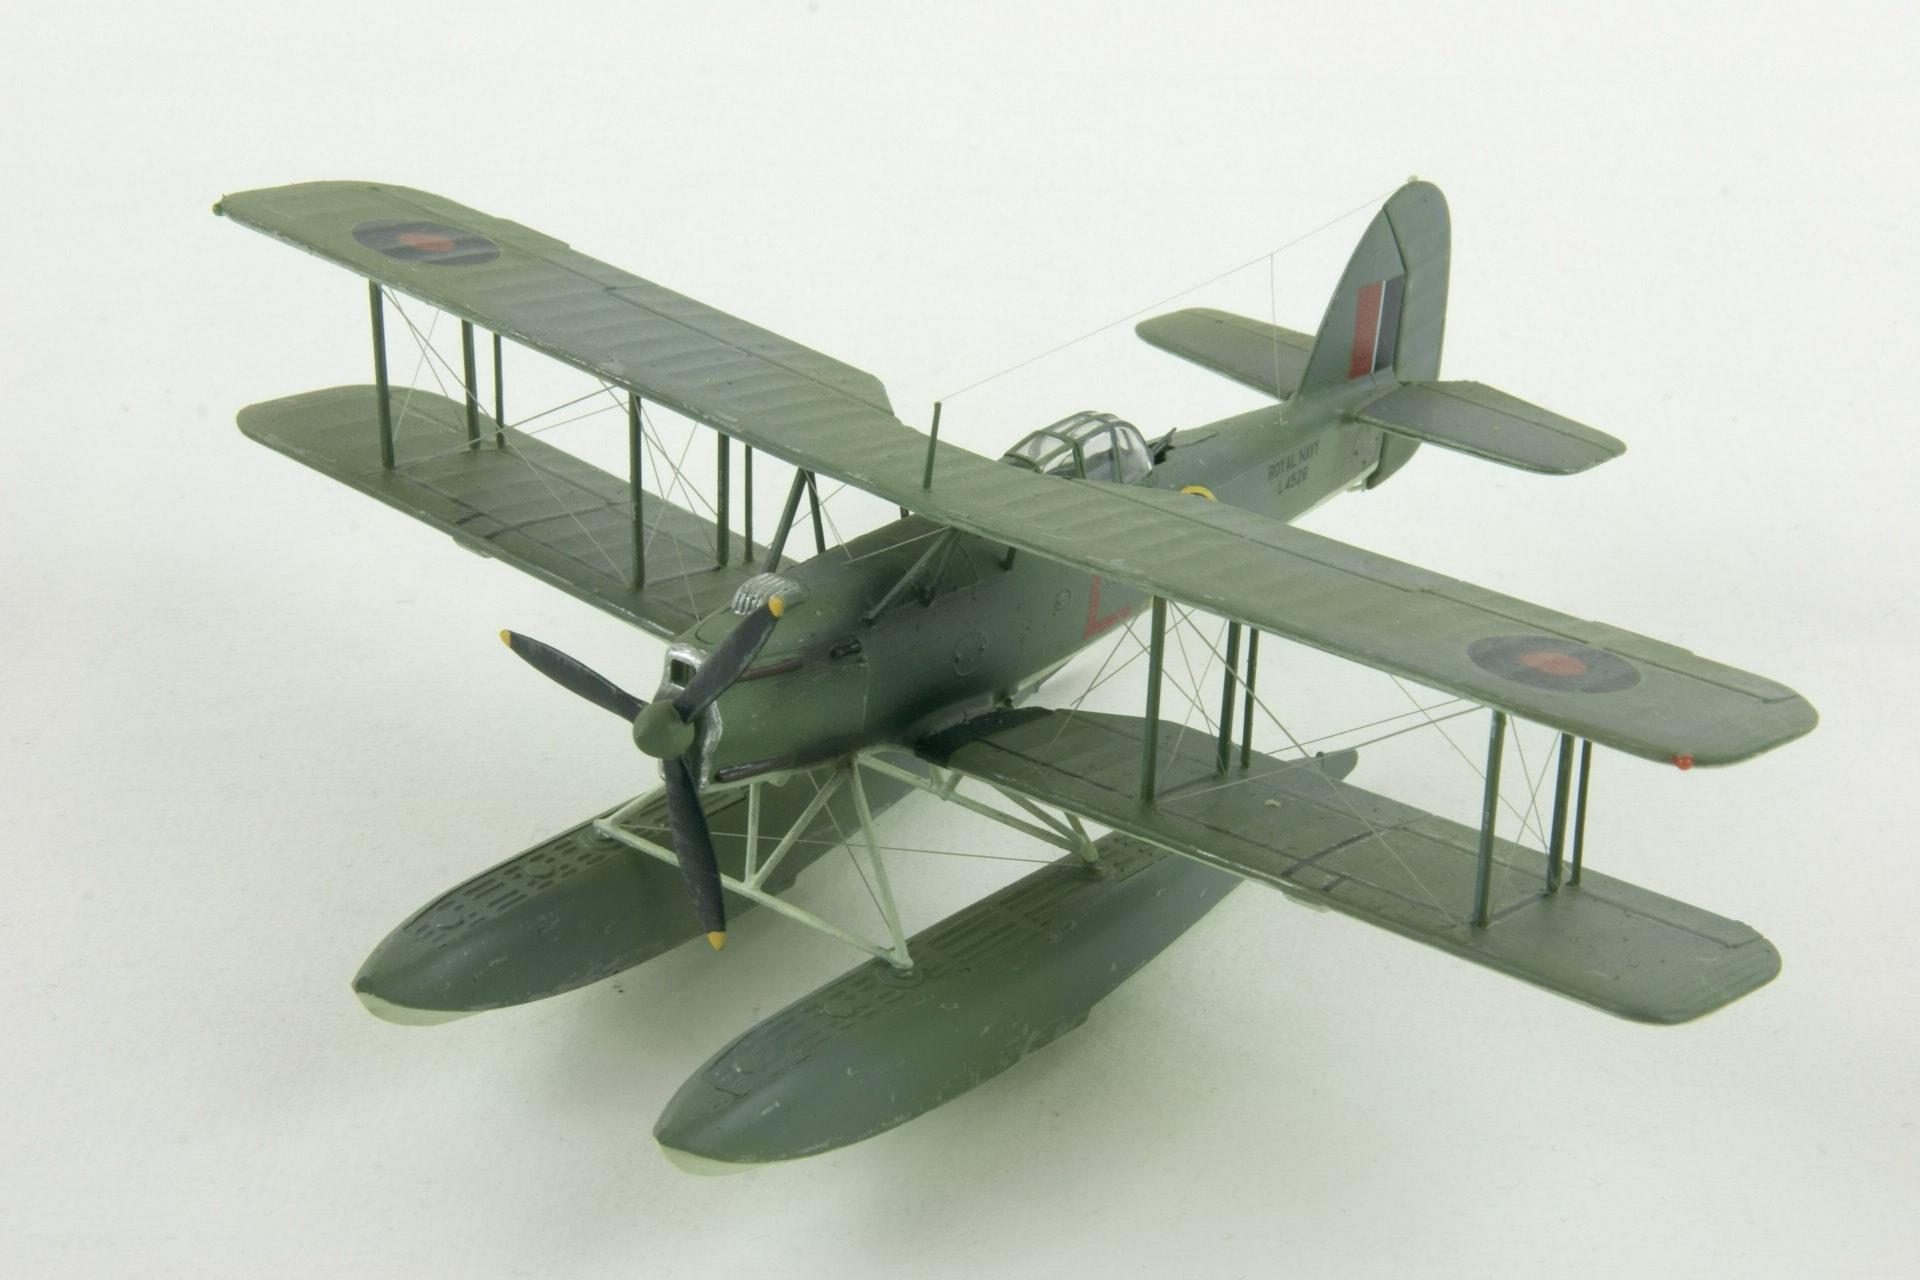 Fairey seafox 1 1